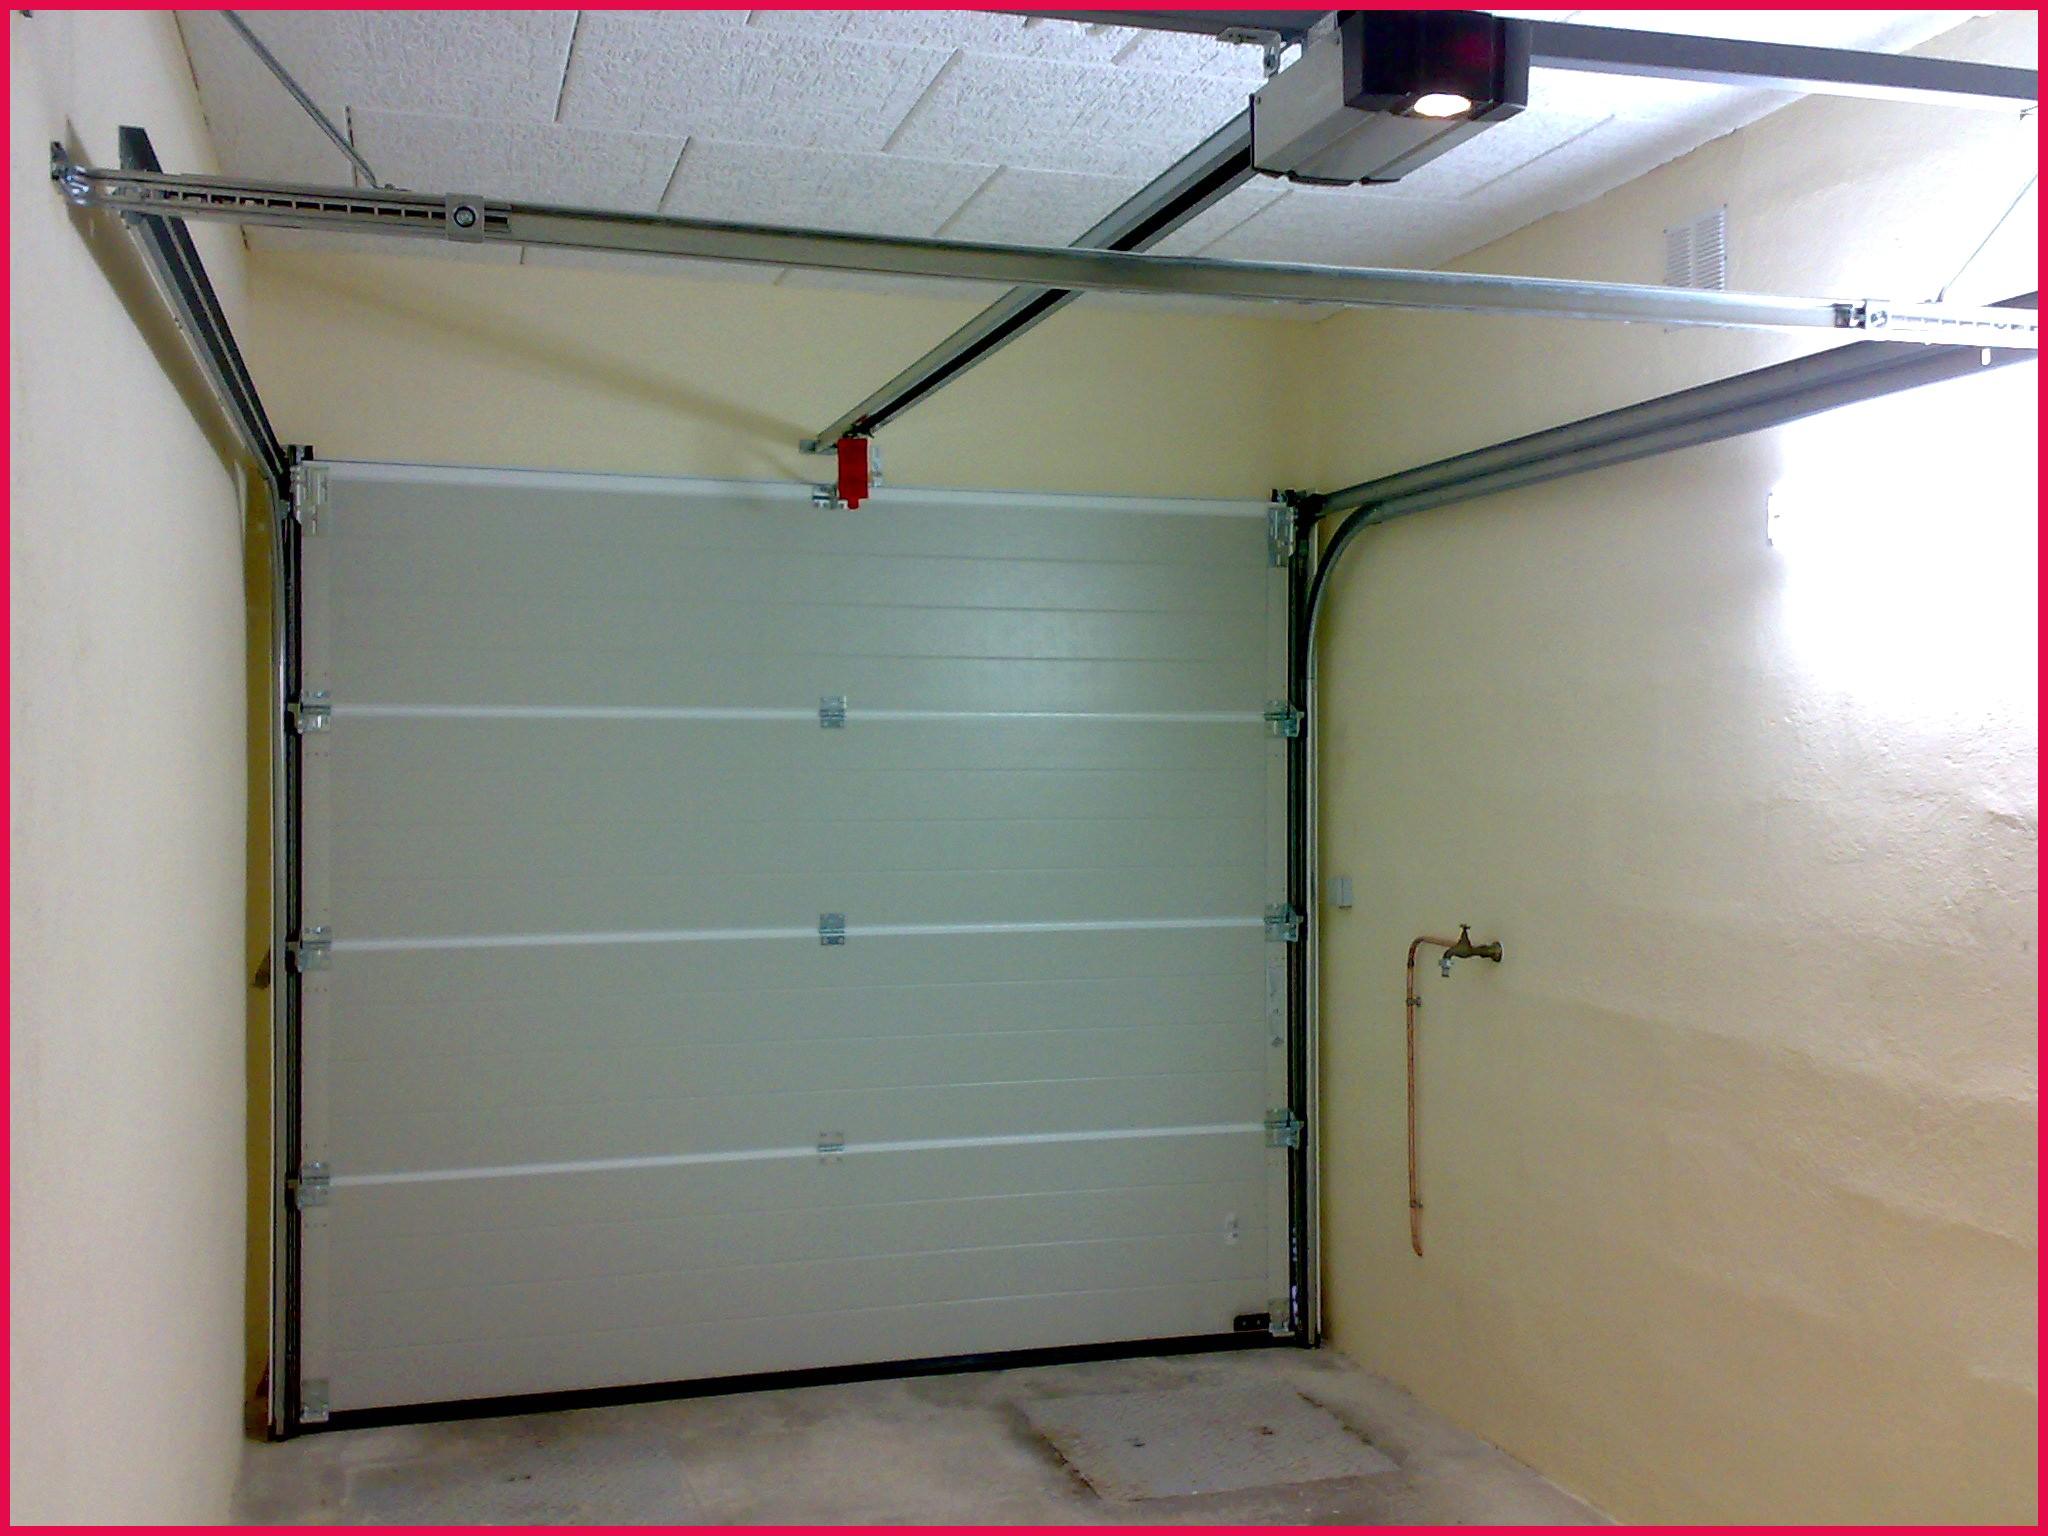 Montage Porte De Garage Basculante Motorisee Deportedd